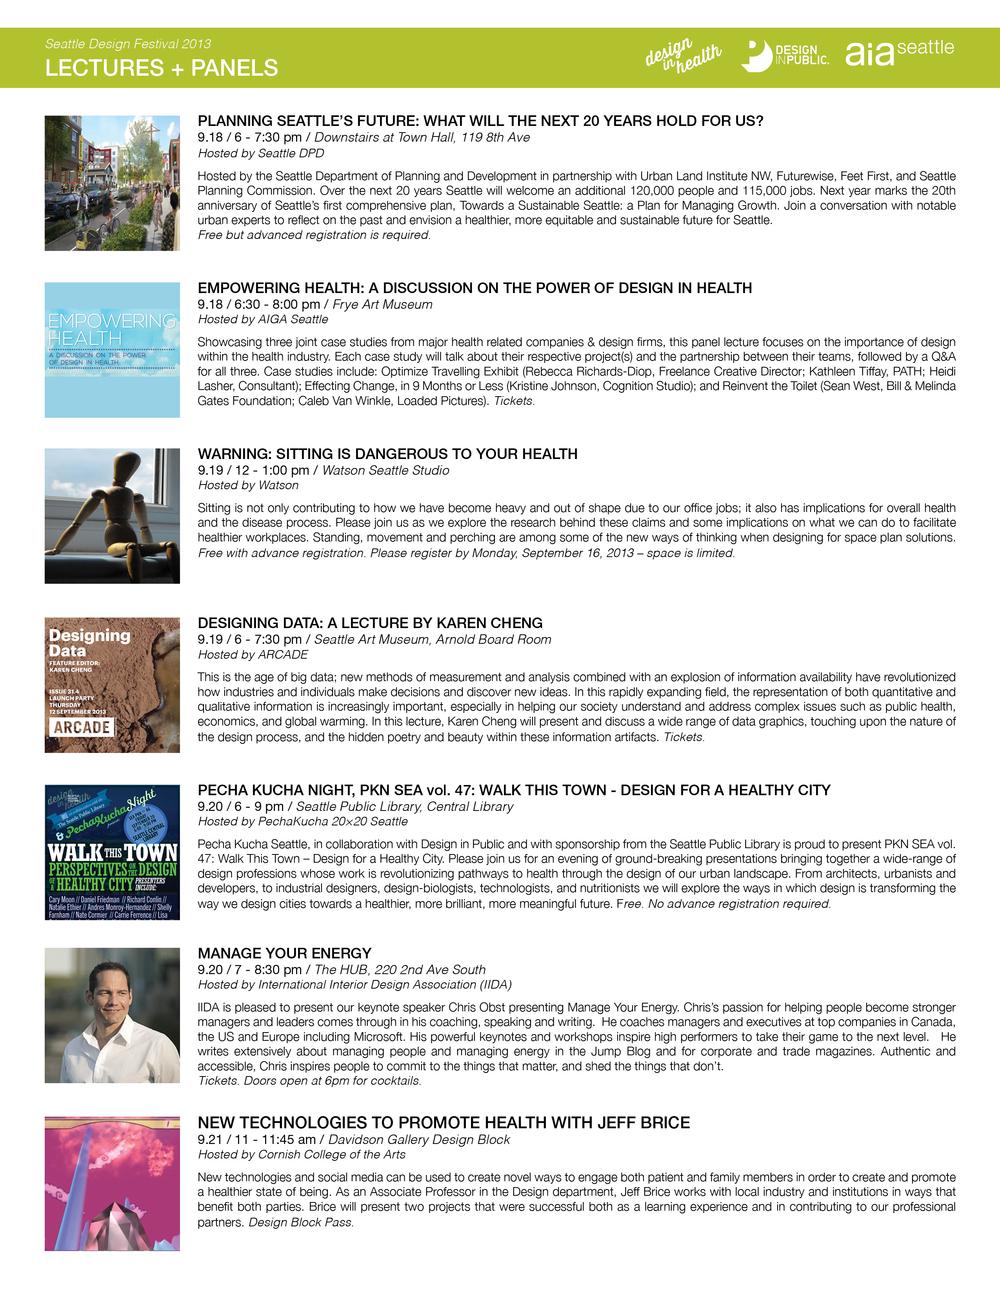 SDF13_festival program_of_events_web24.jpg